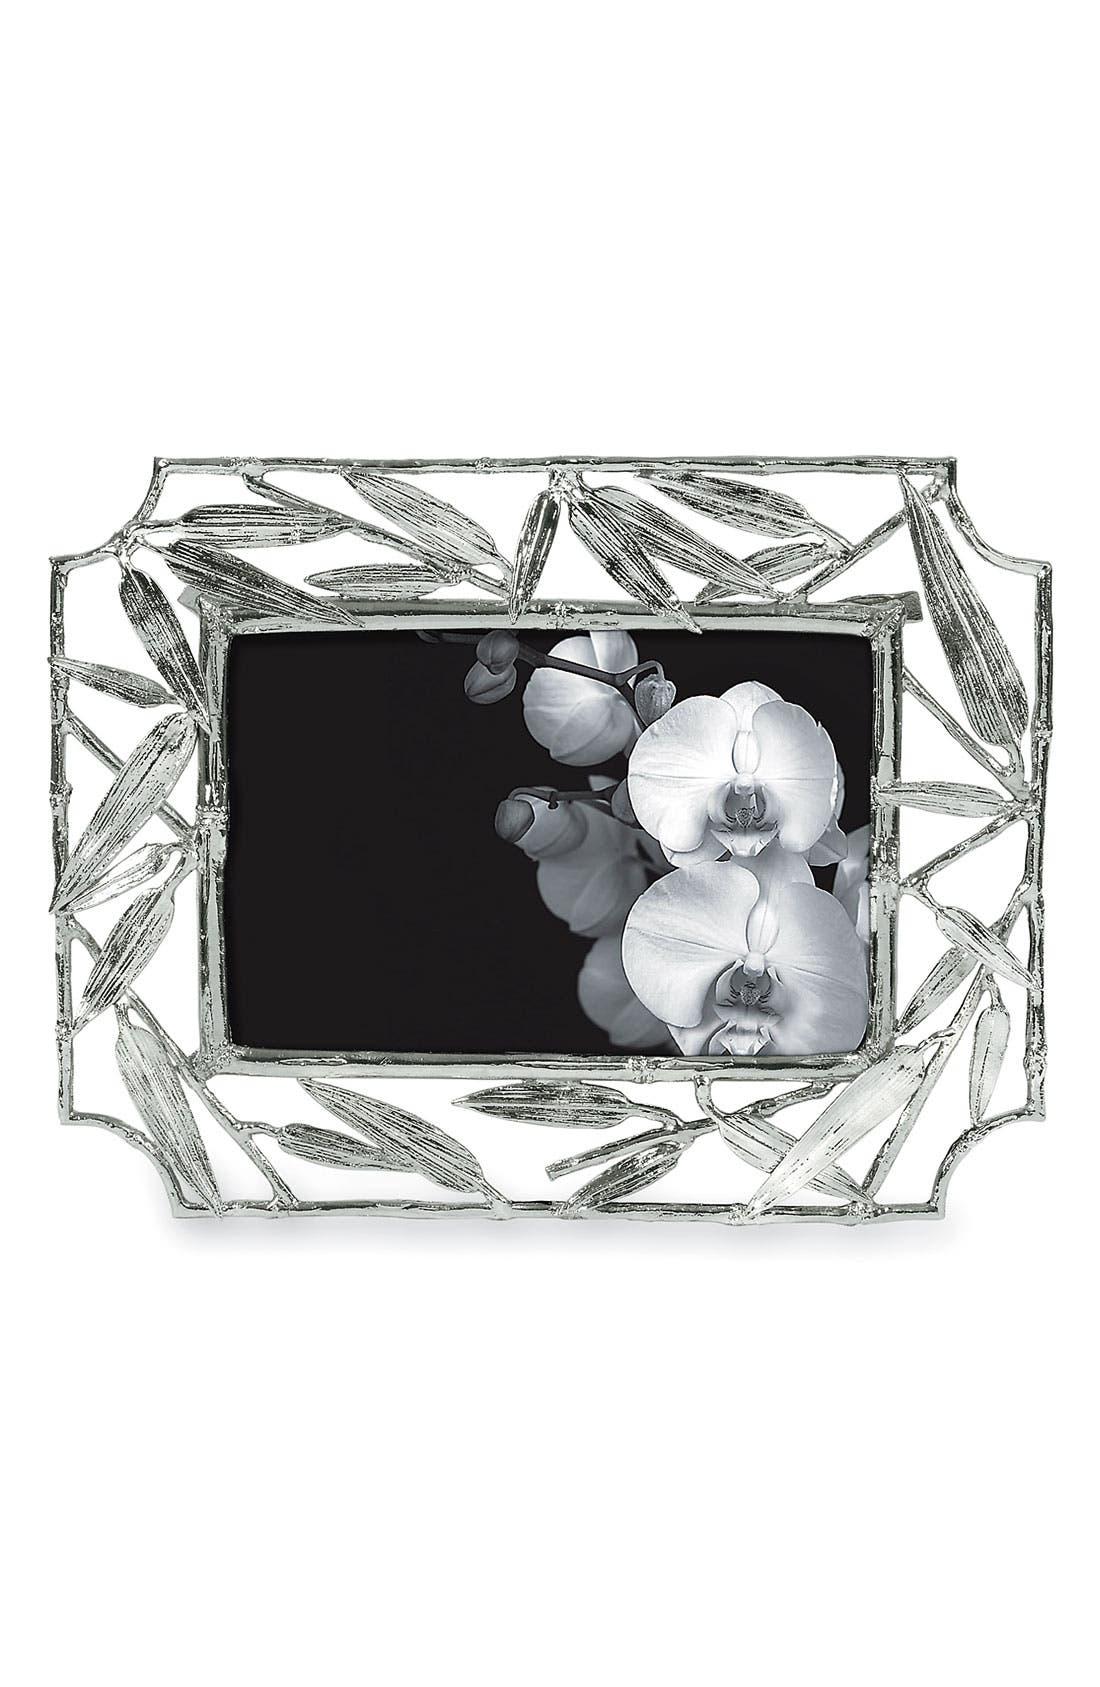 Main Image - Michael Aram 'Bamboo' 4x6 Frame